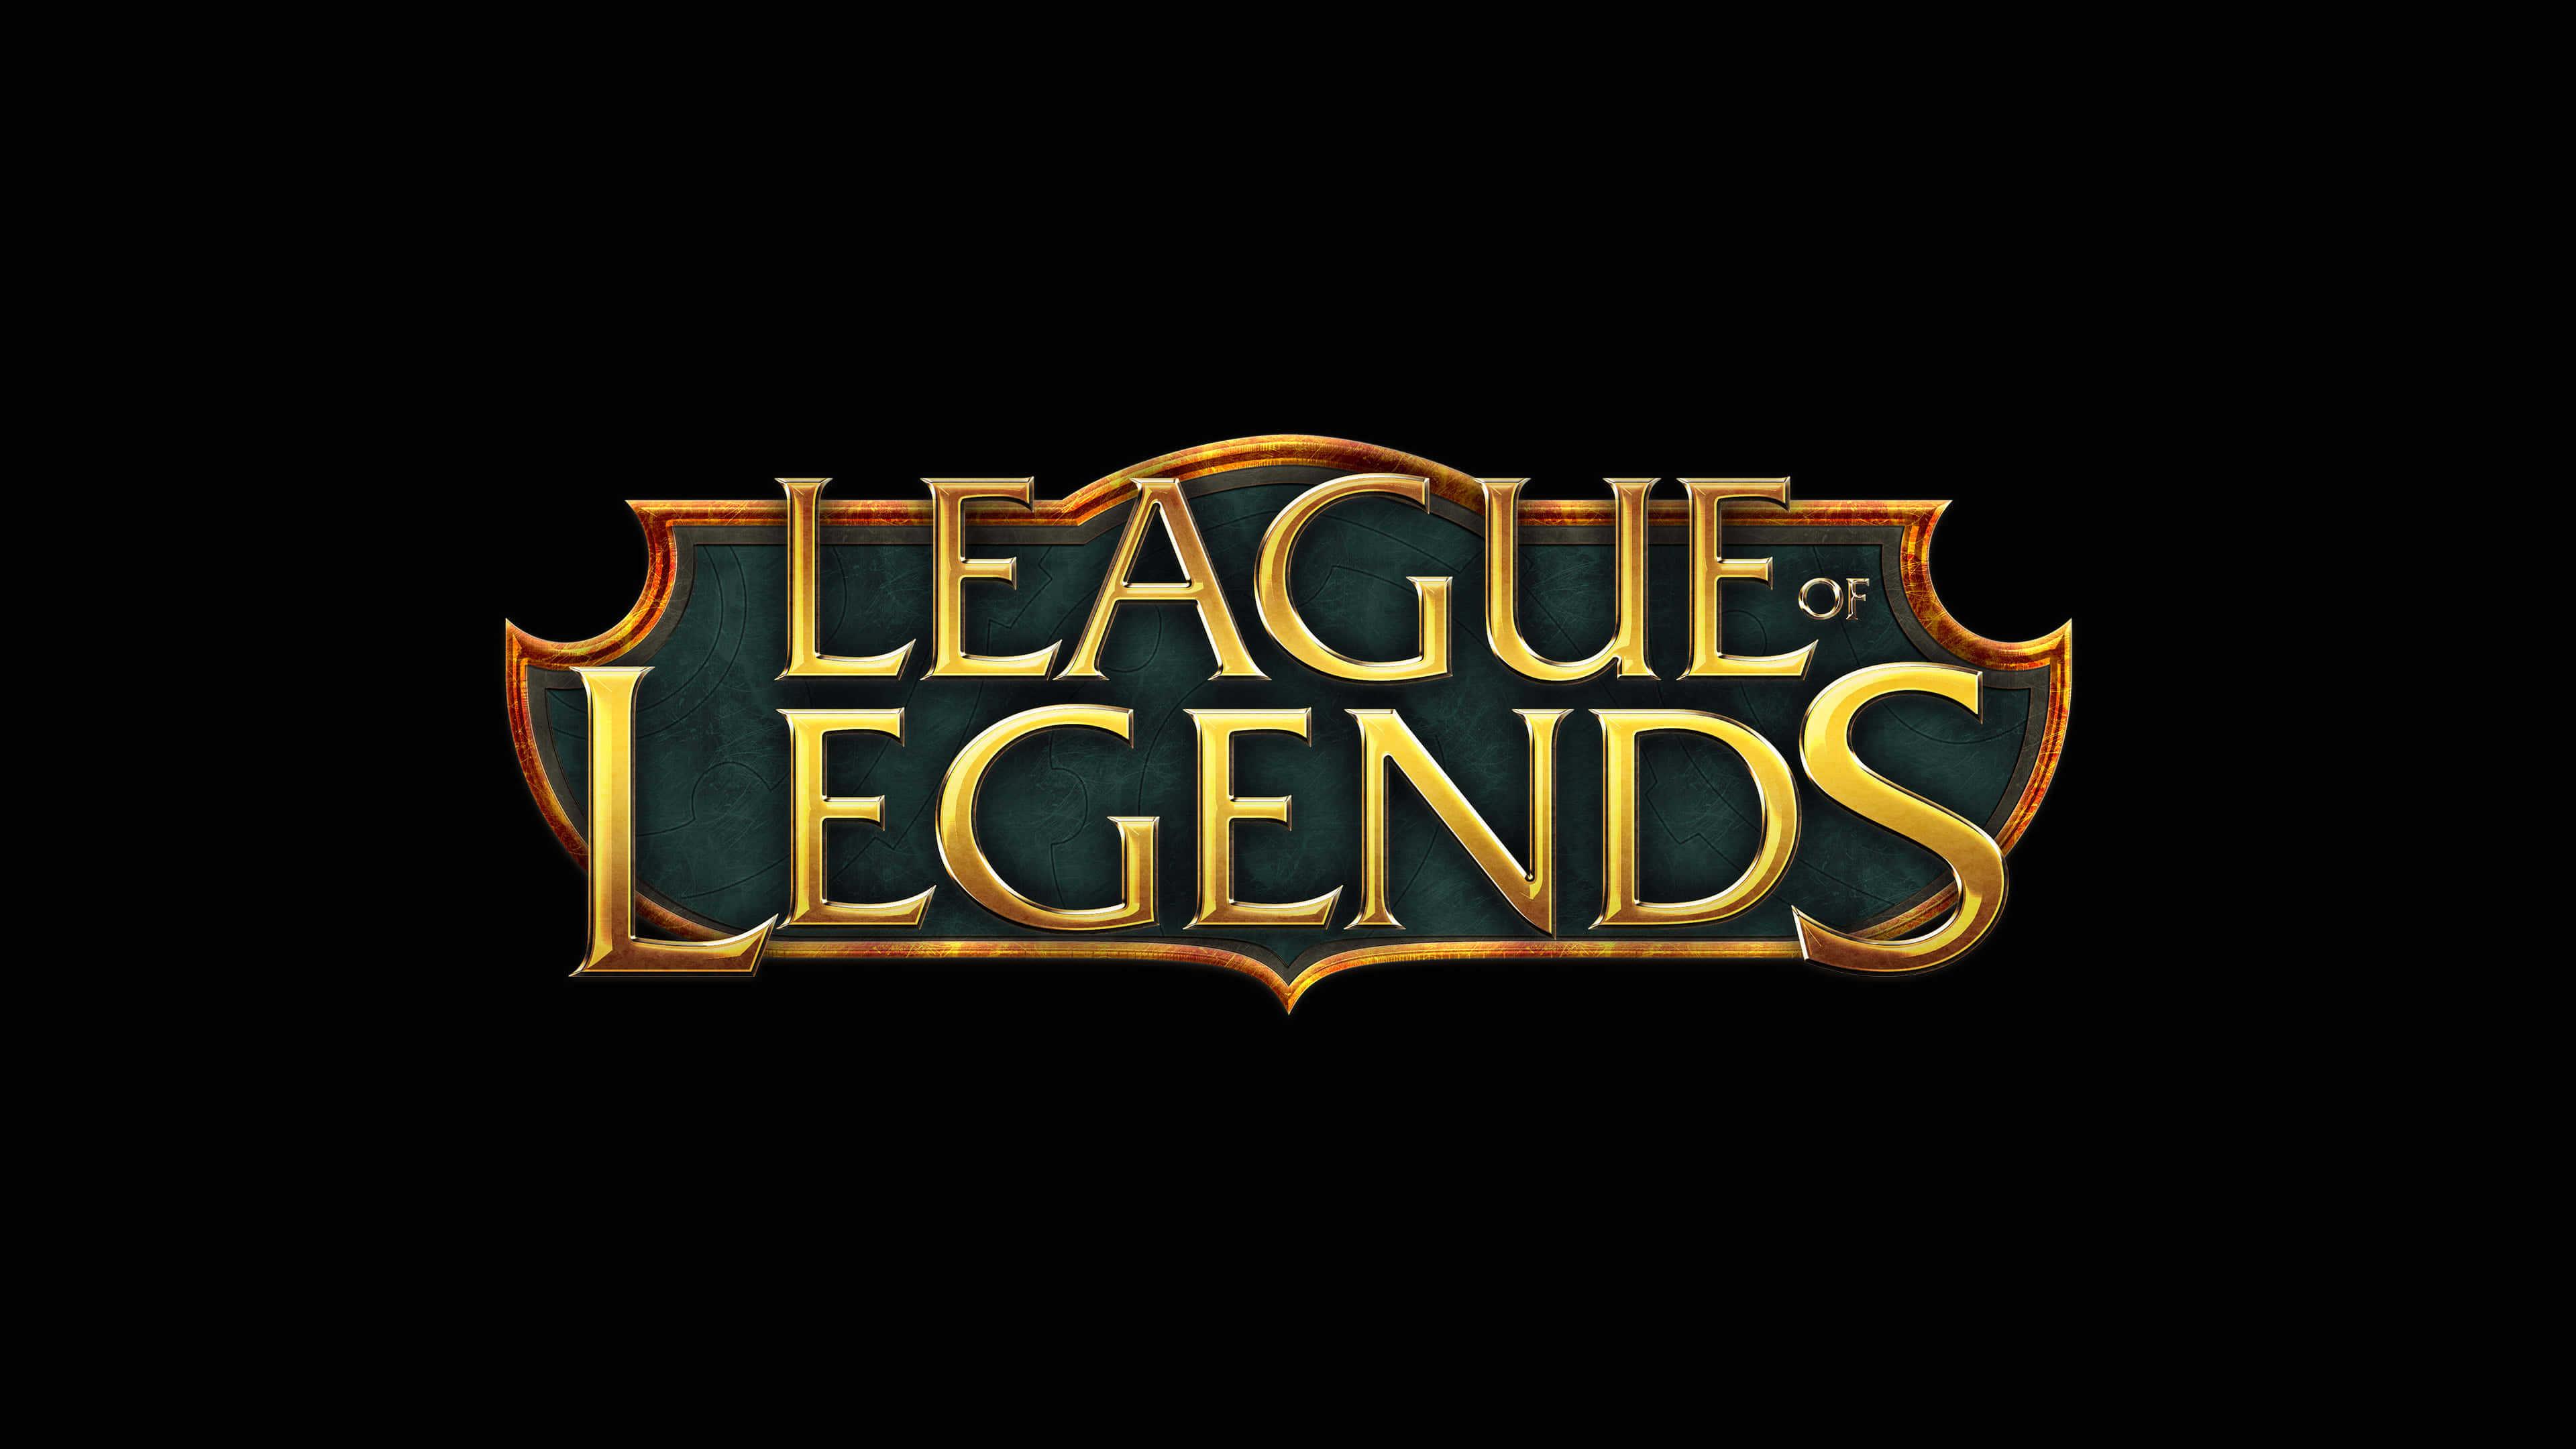 League Of Legends Logo UHD 4K Wallpaper Pixelz 3840x2160